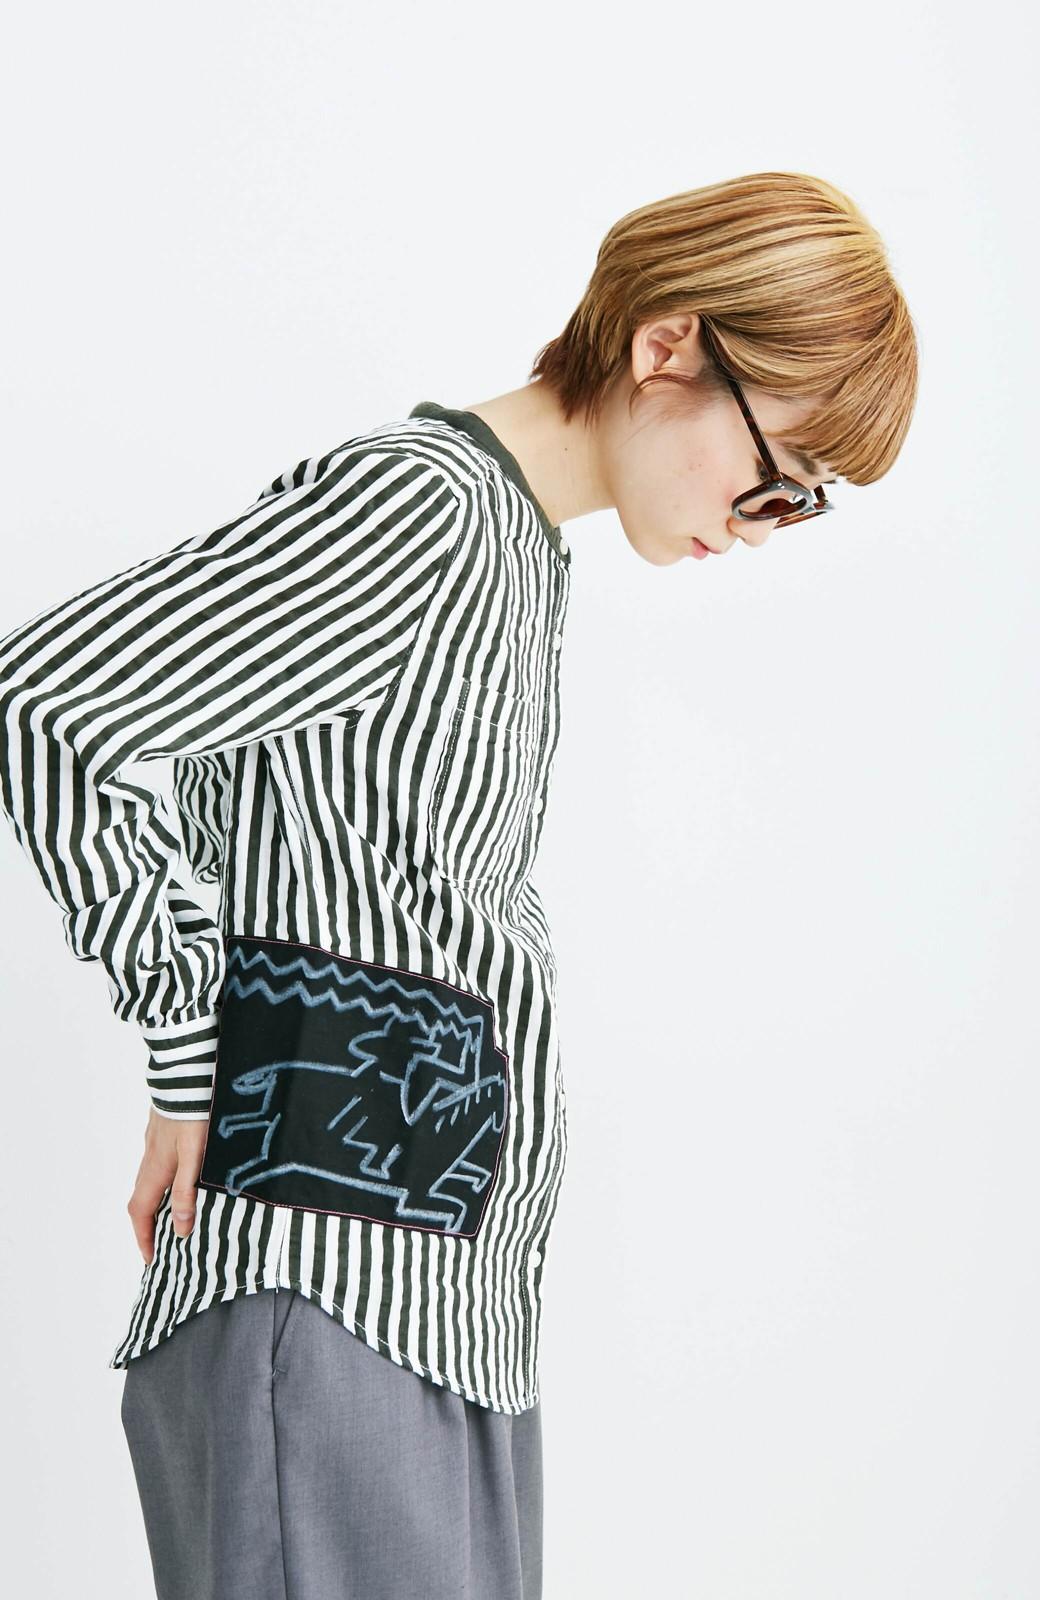 haco! co&tion 遠山敦ストライプシャツ【アーティスト監修10点もの】 <ブラック×ホワイト>の商品写真5